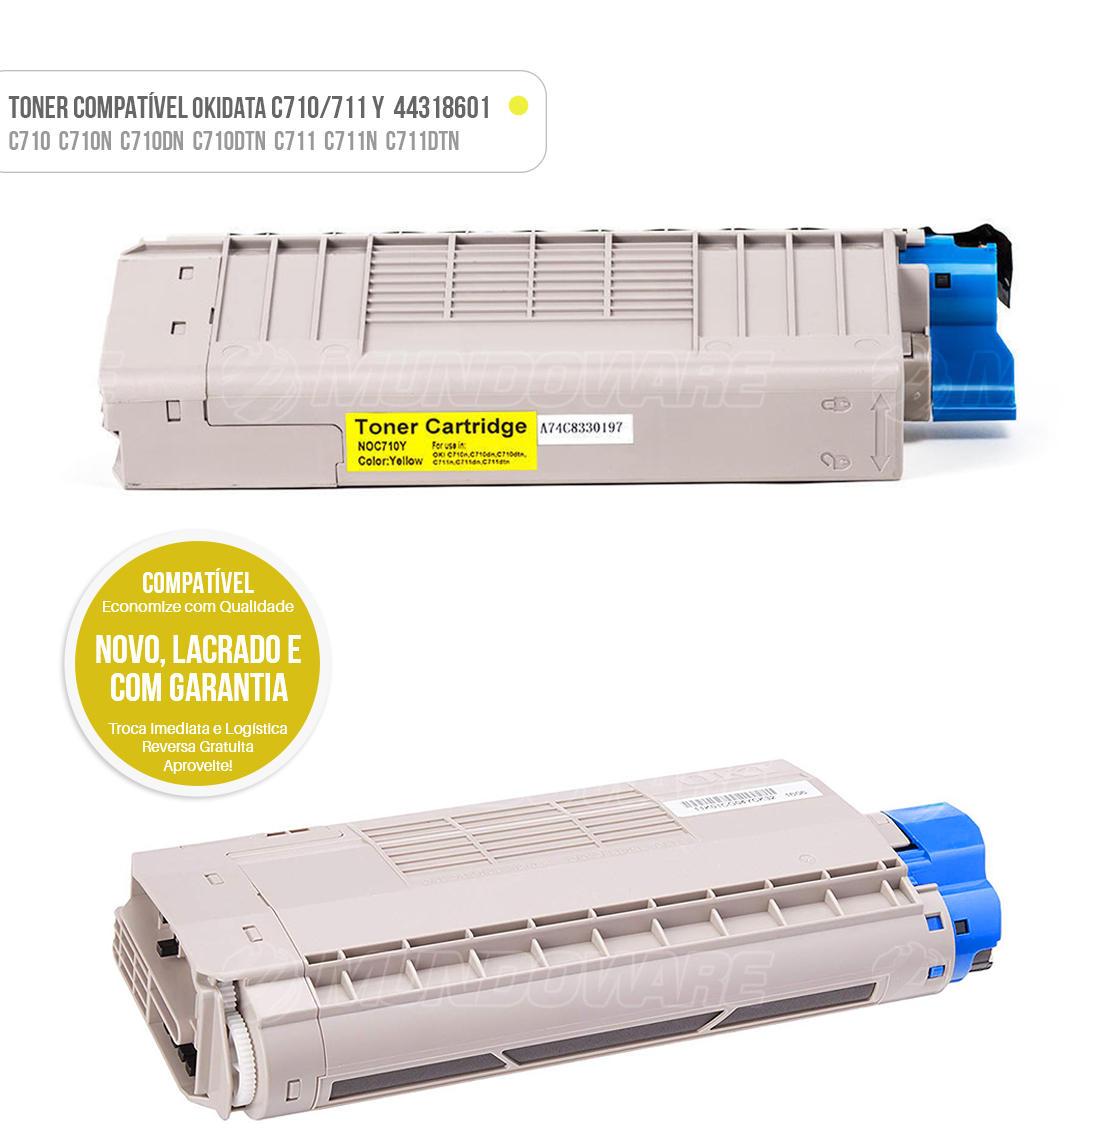 Toner Amarelo Compatível para impressora Okidata C710 C710N C710DN C710DTN C711 C711N C711DTN Tonner